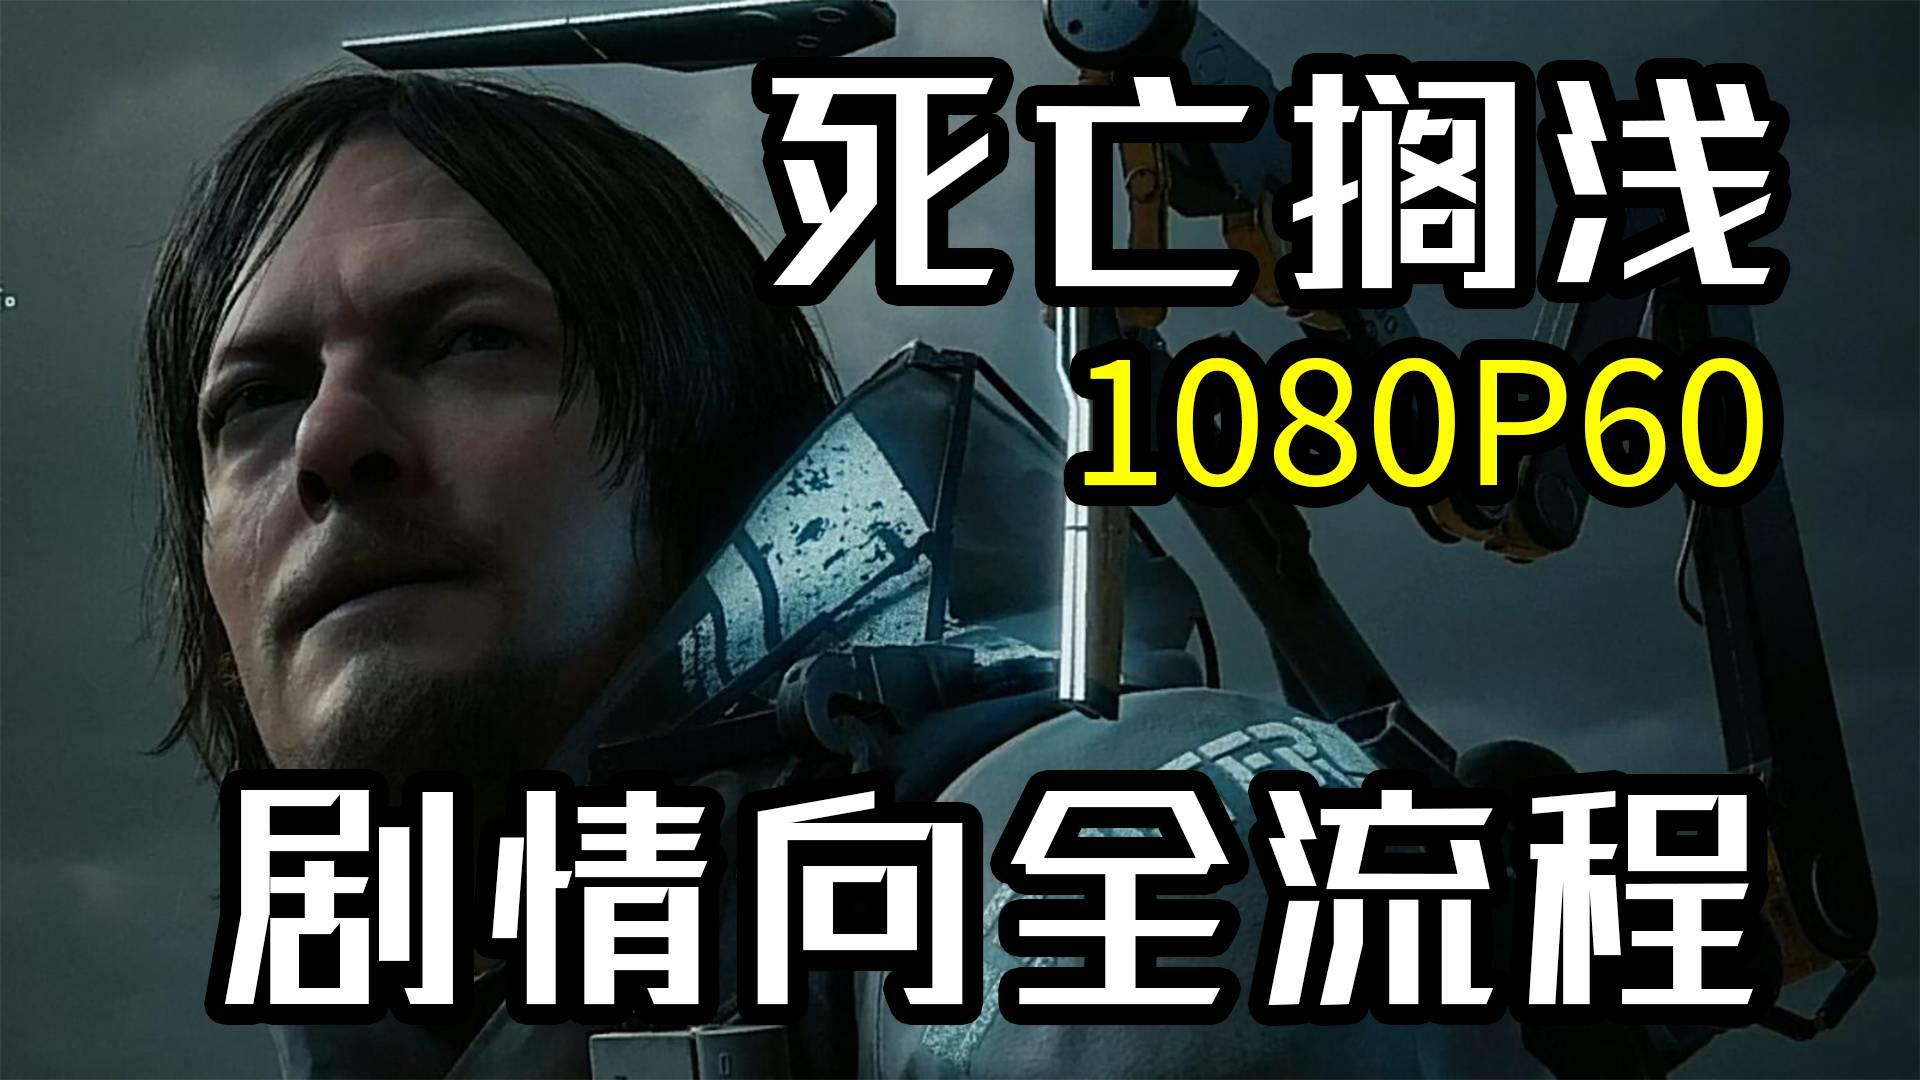 【QPC】死亡搁浅-剧情向全流程解说(合集)困难模式(完结)